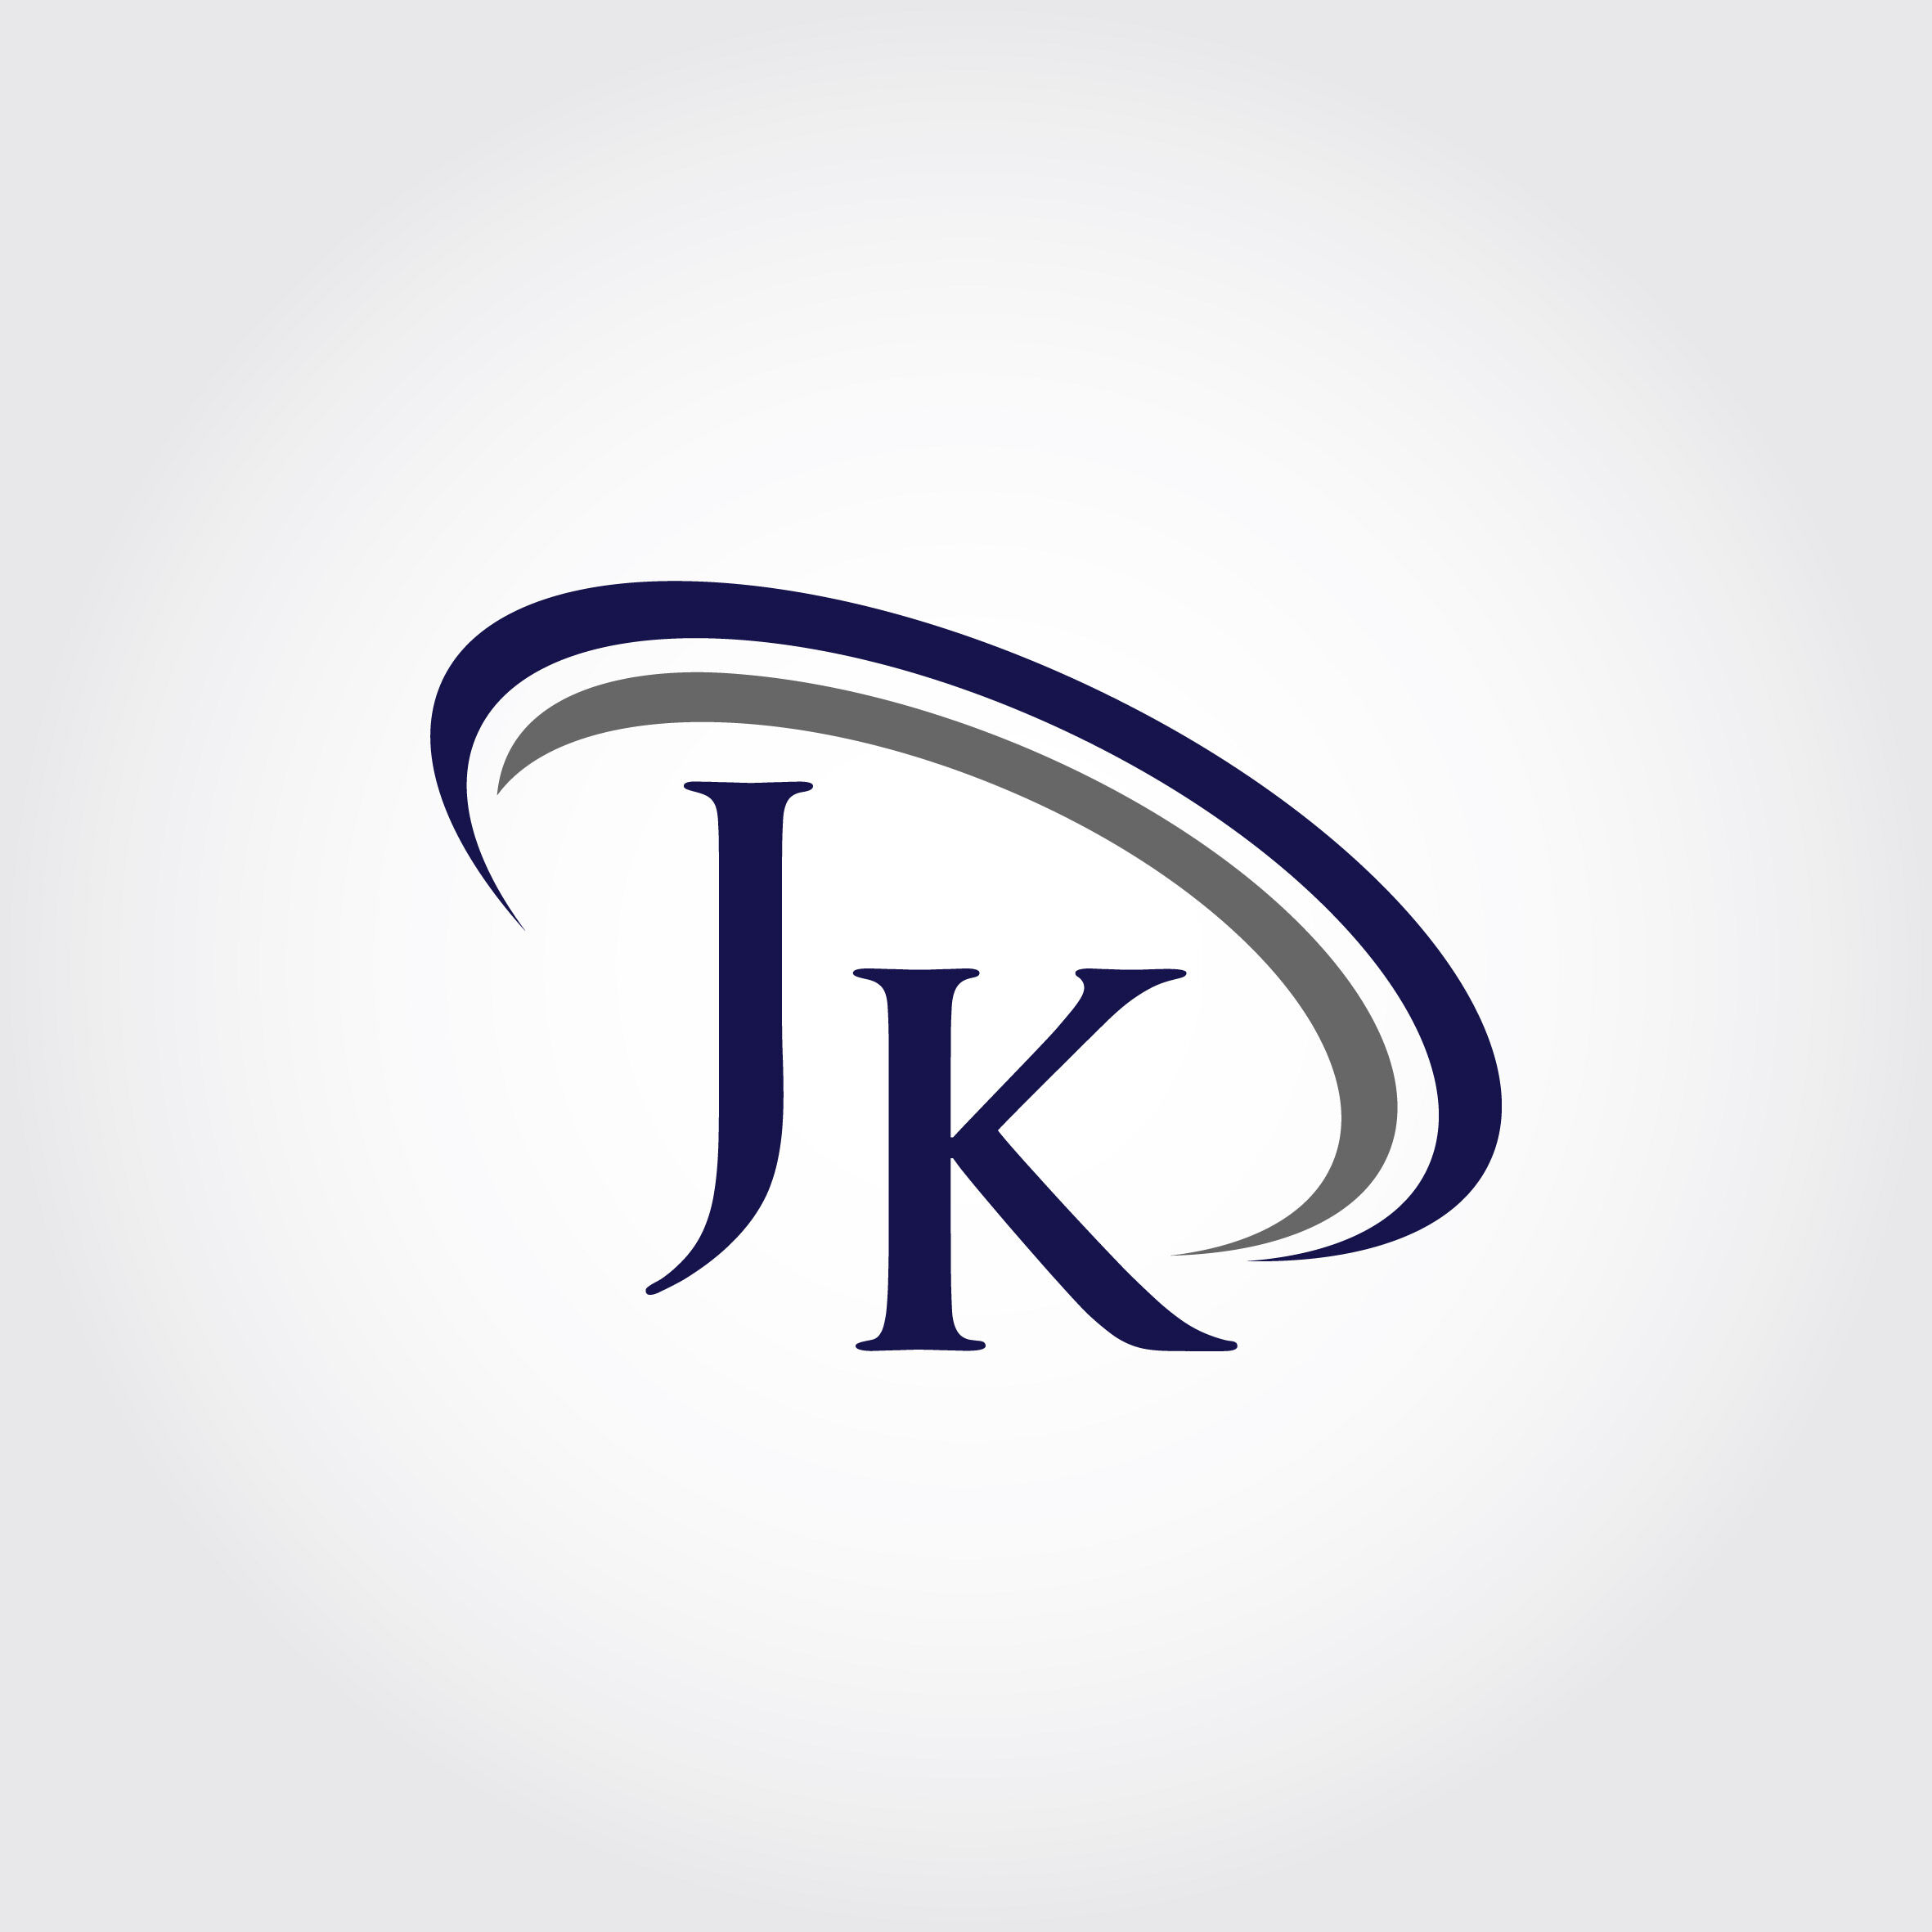 Monogram JK Logo Design By Vectorseller